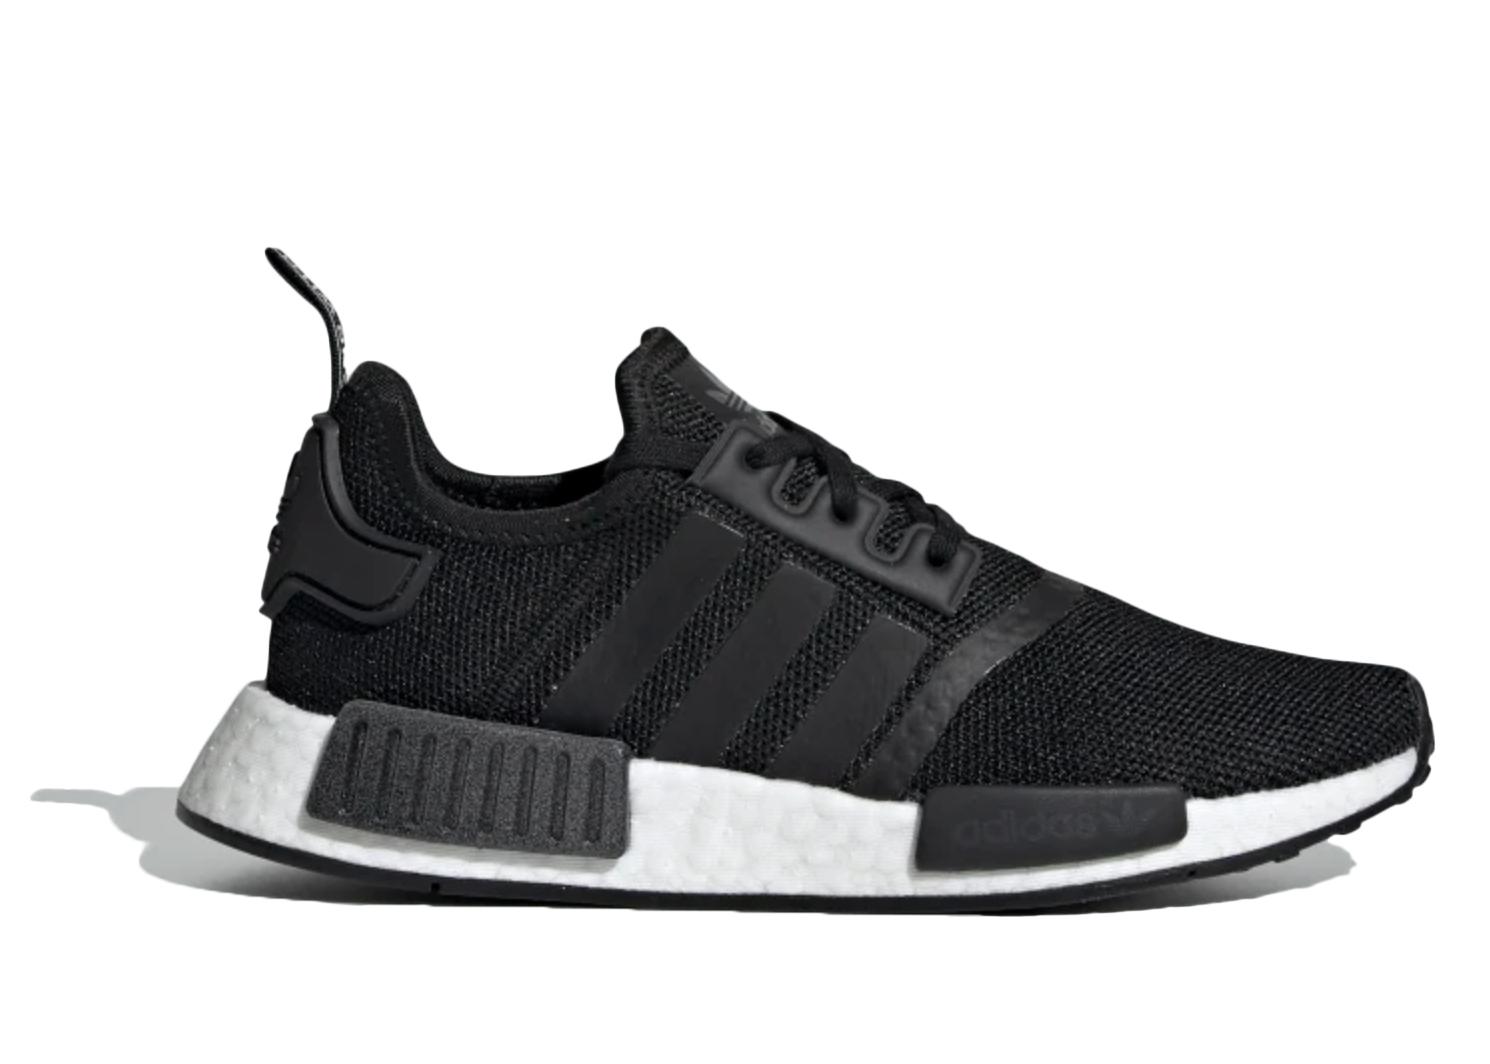 Adidas Originals Adidas Nmd R1 Core Black White (gs) In Core Black/core Black/cloud White